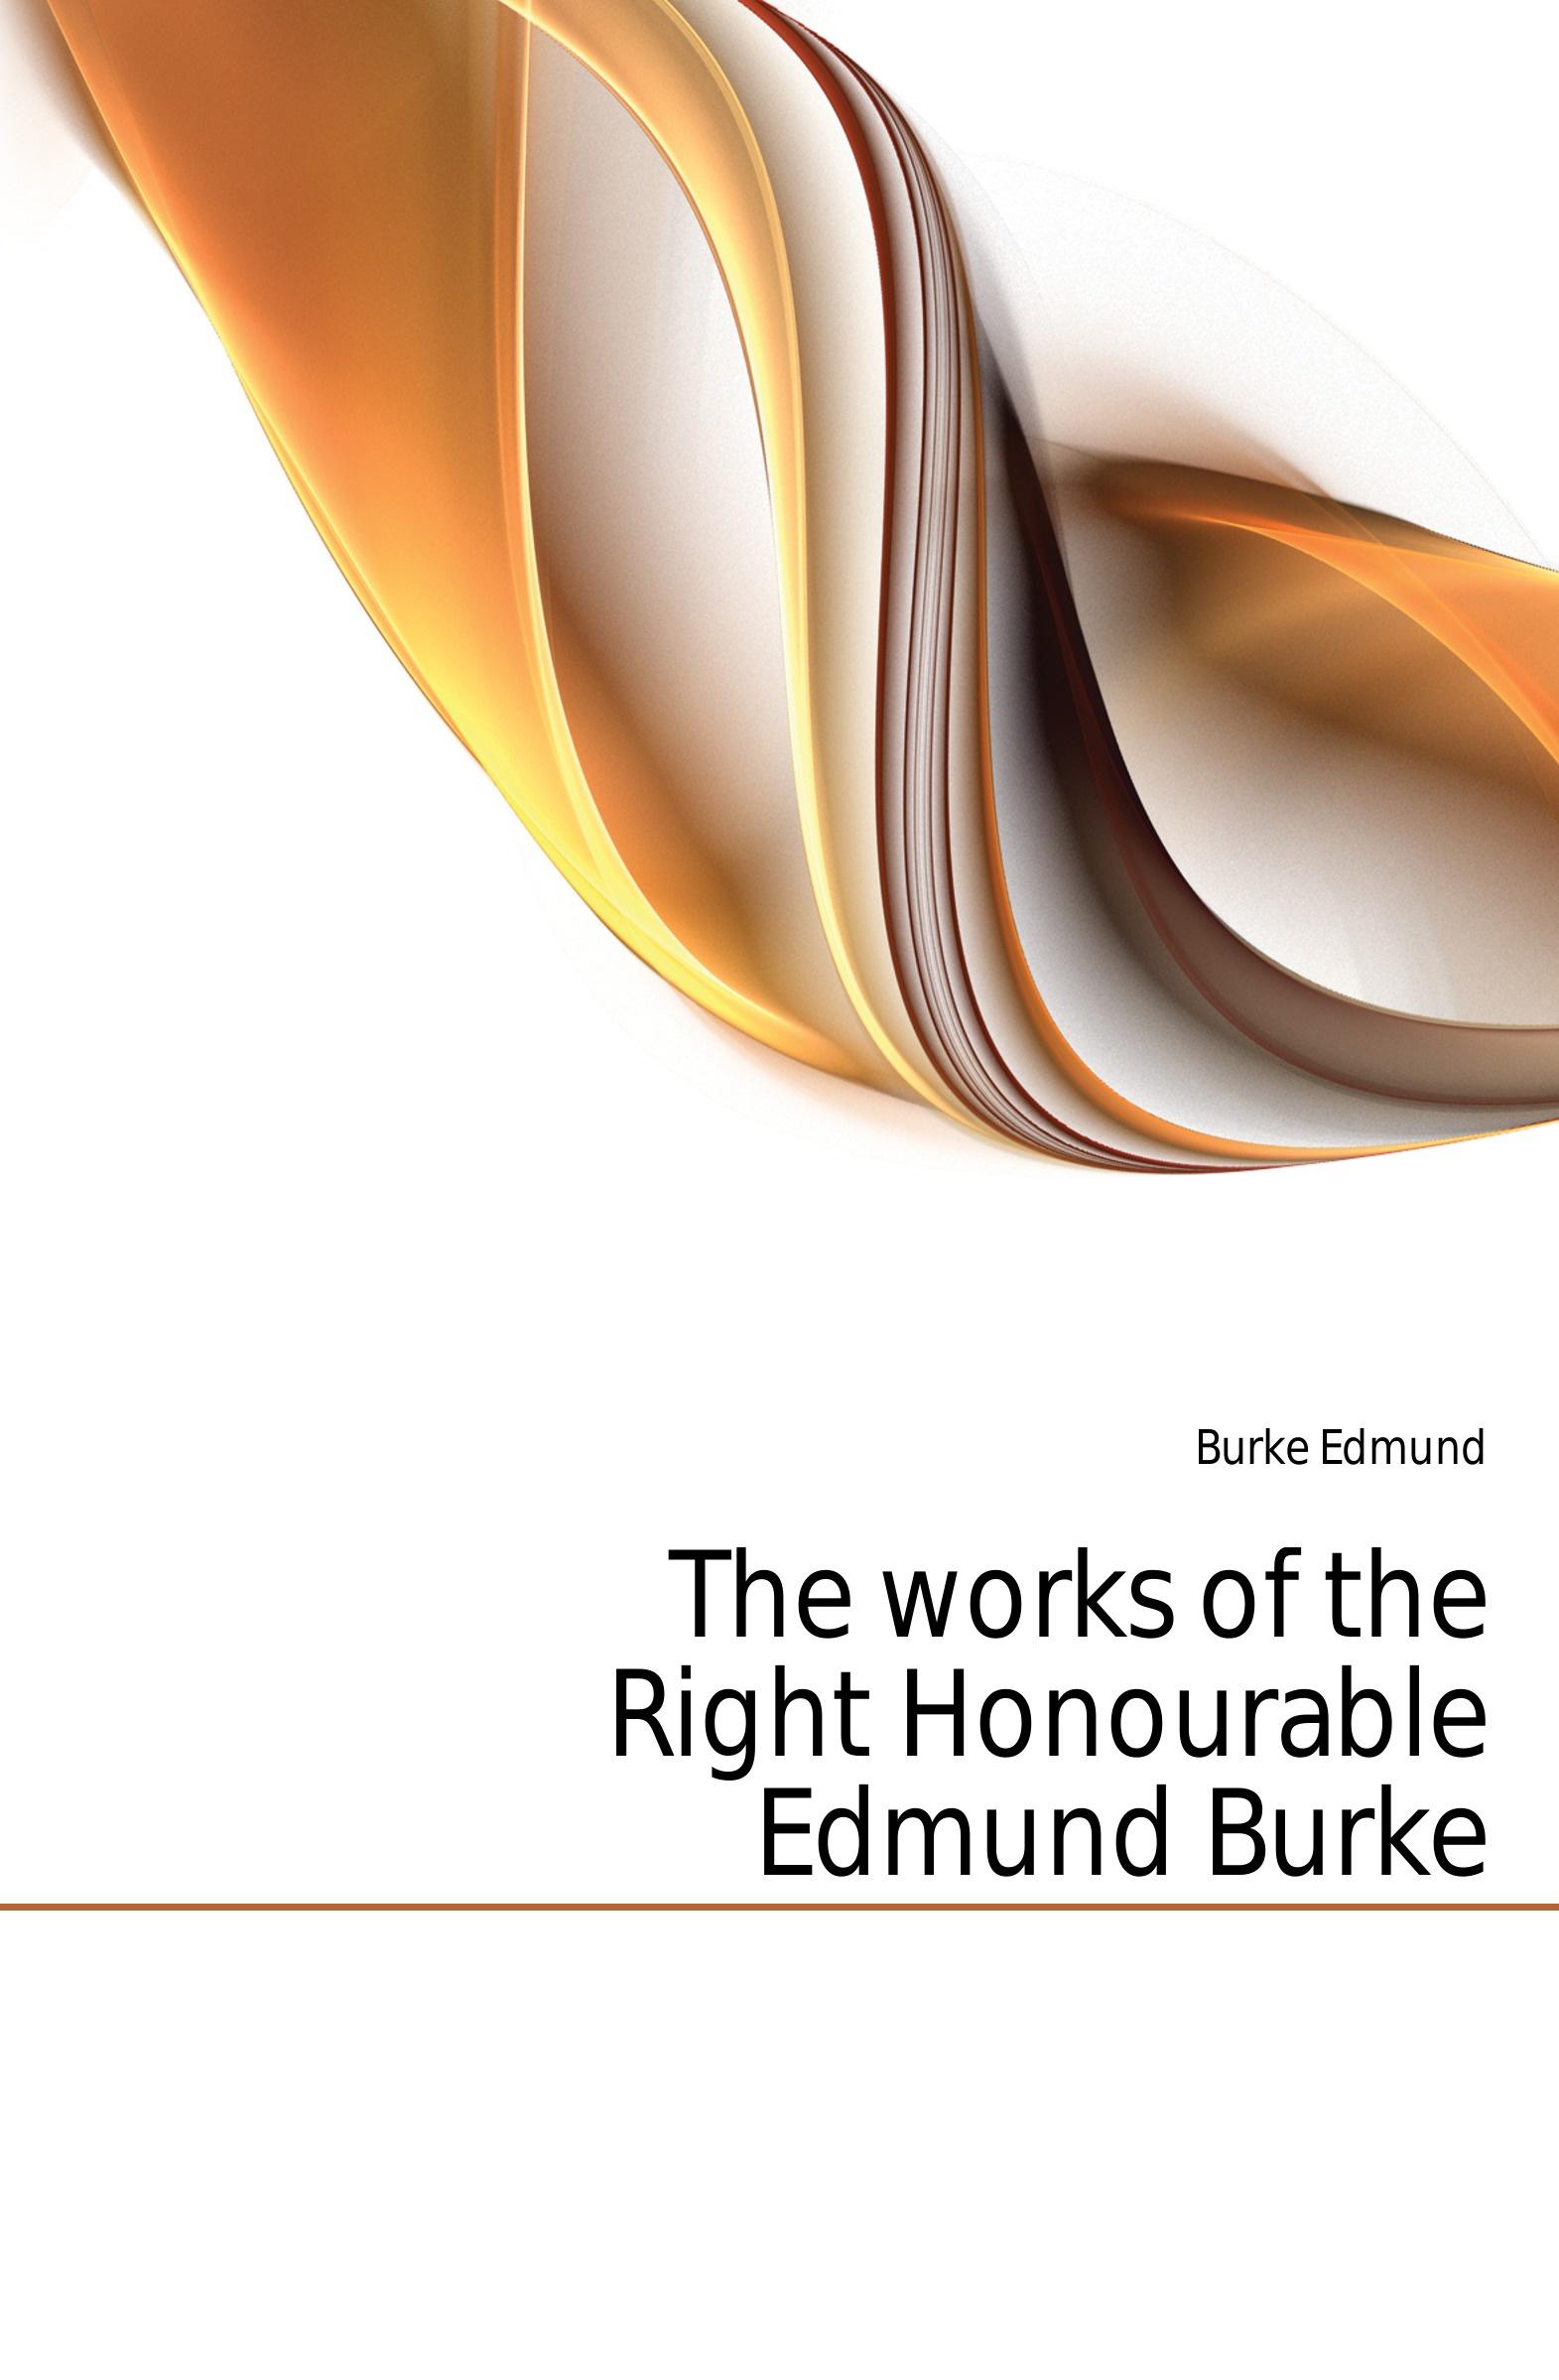 Burke Edmund The works of the Right Honourable Edmund Burke цена в Москве и Питере